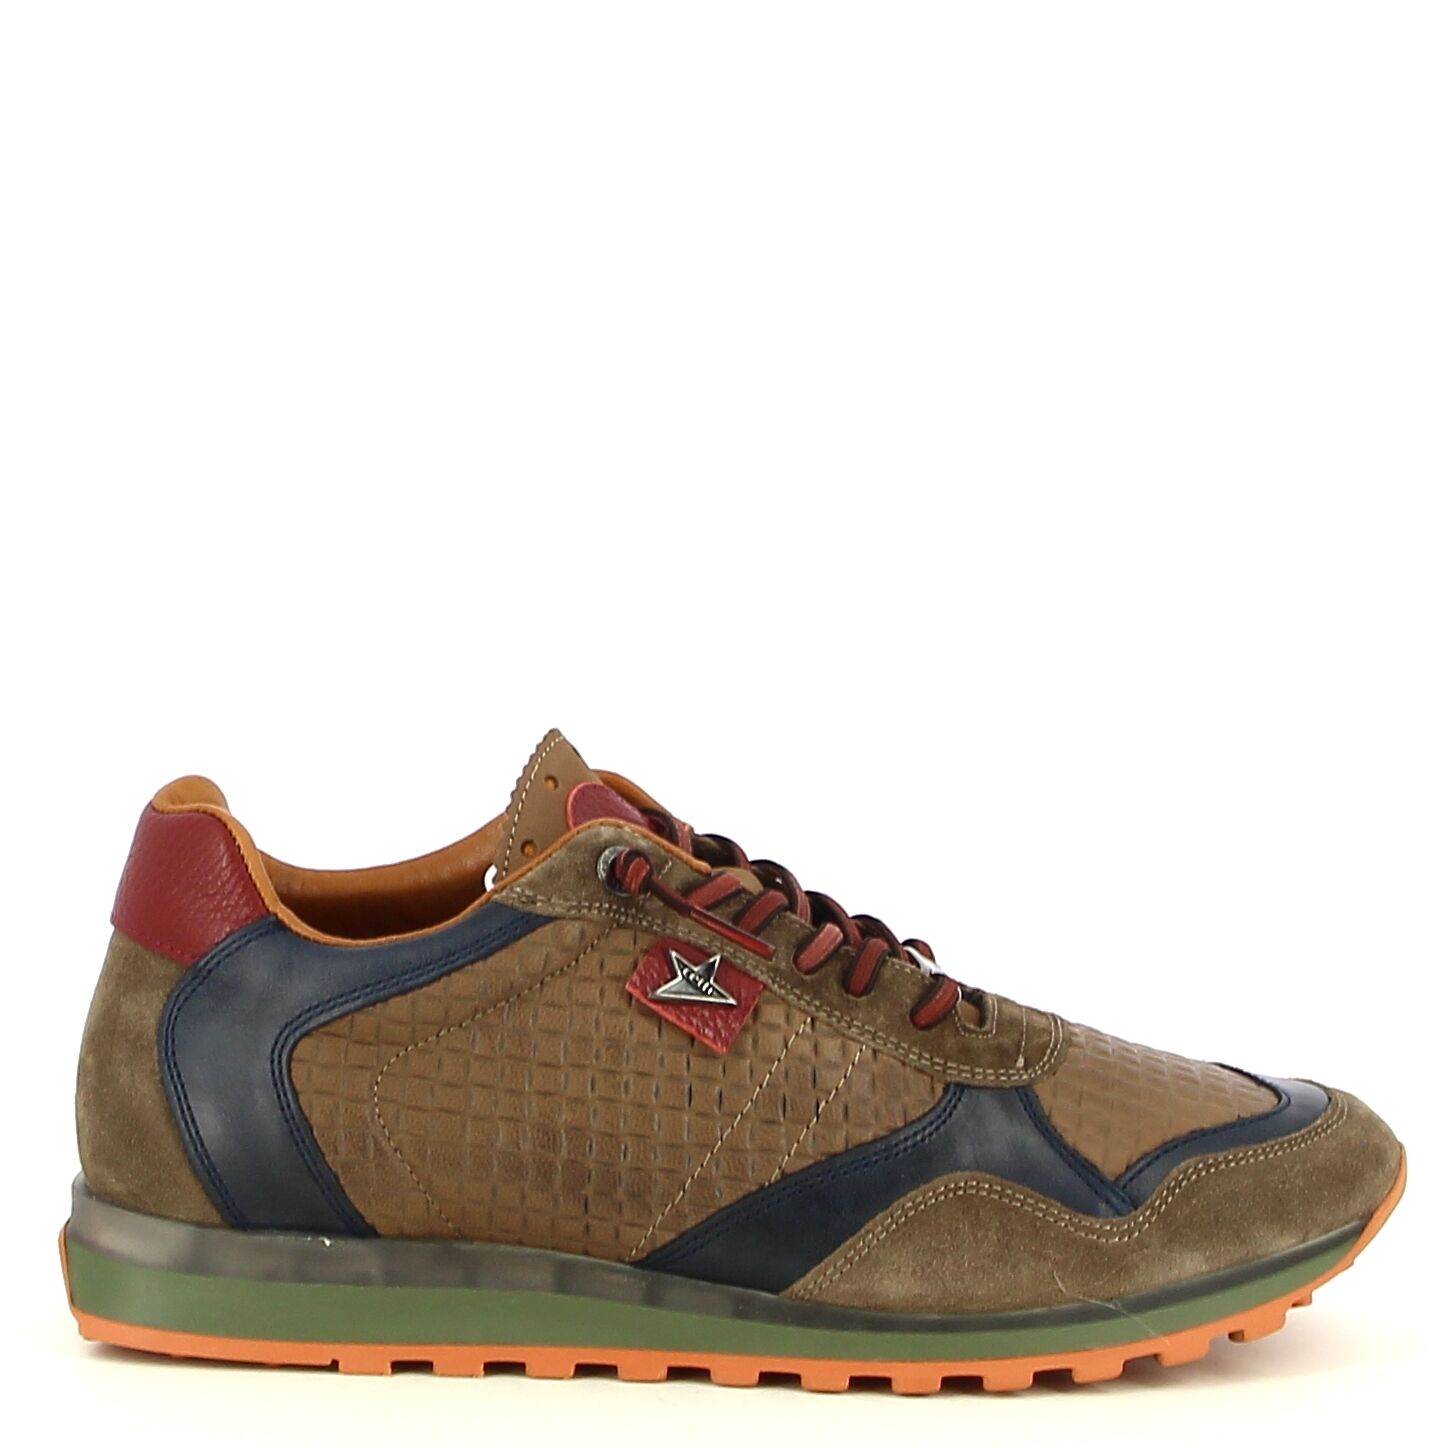 Cetti - Camel - Sneakers